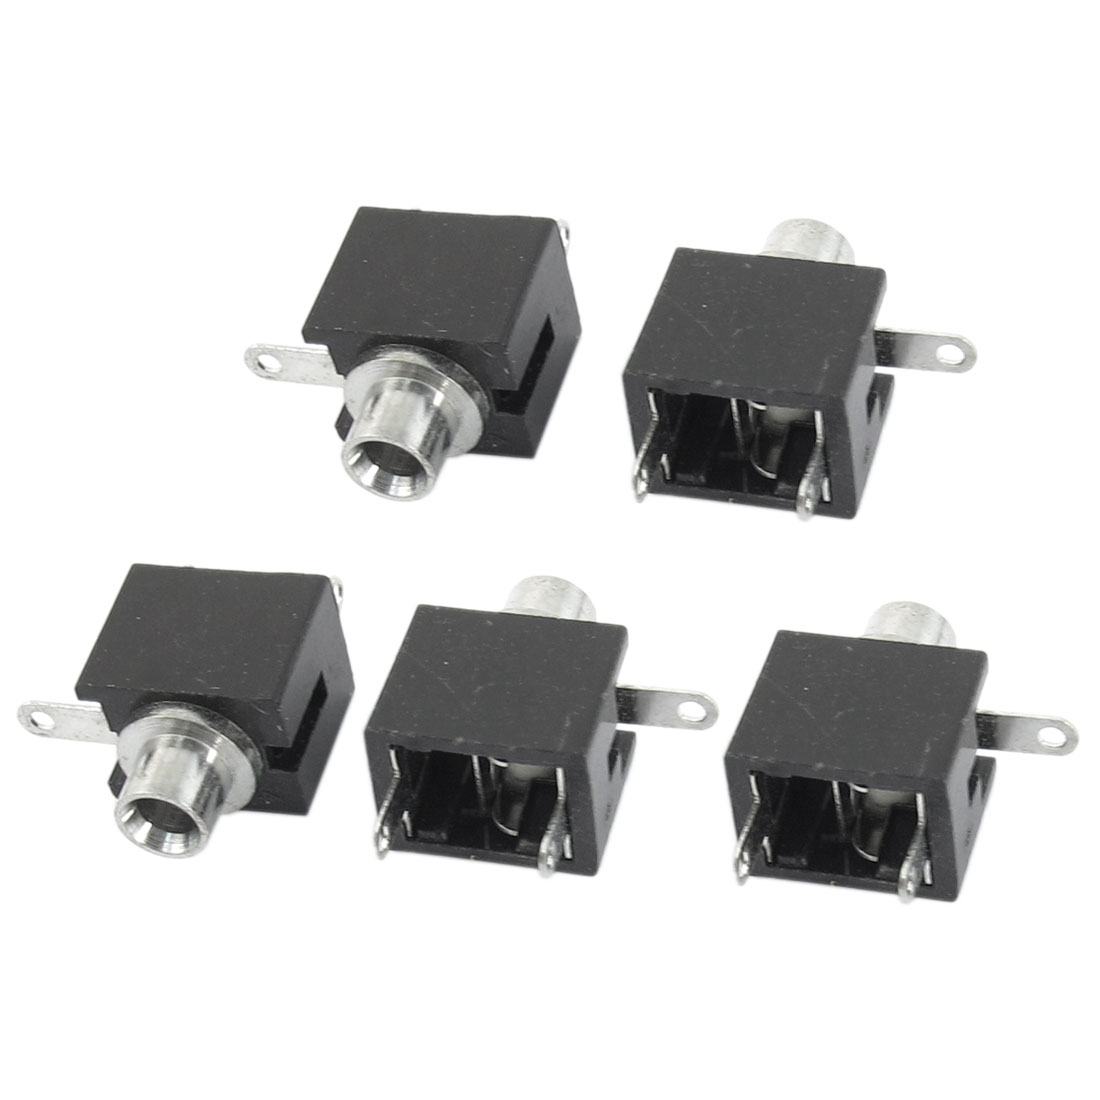 medium resolution of 5pcs 3 5mm mono female socket audio jack soldering pcb panel mount5pcs 3 5mm mono female